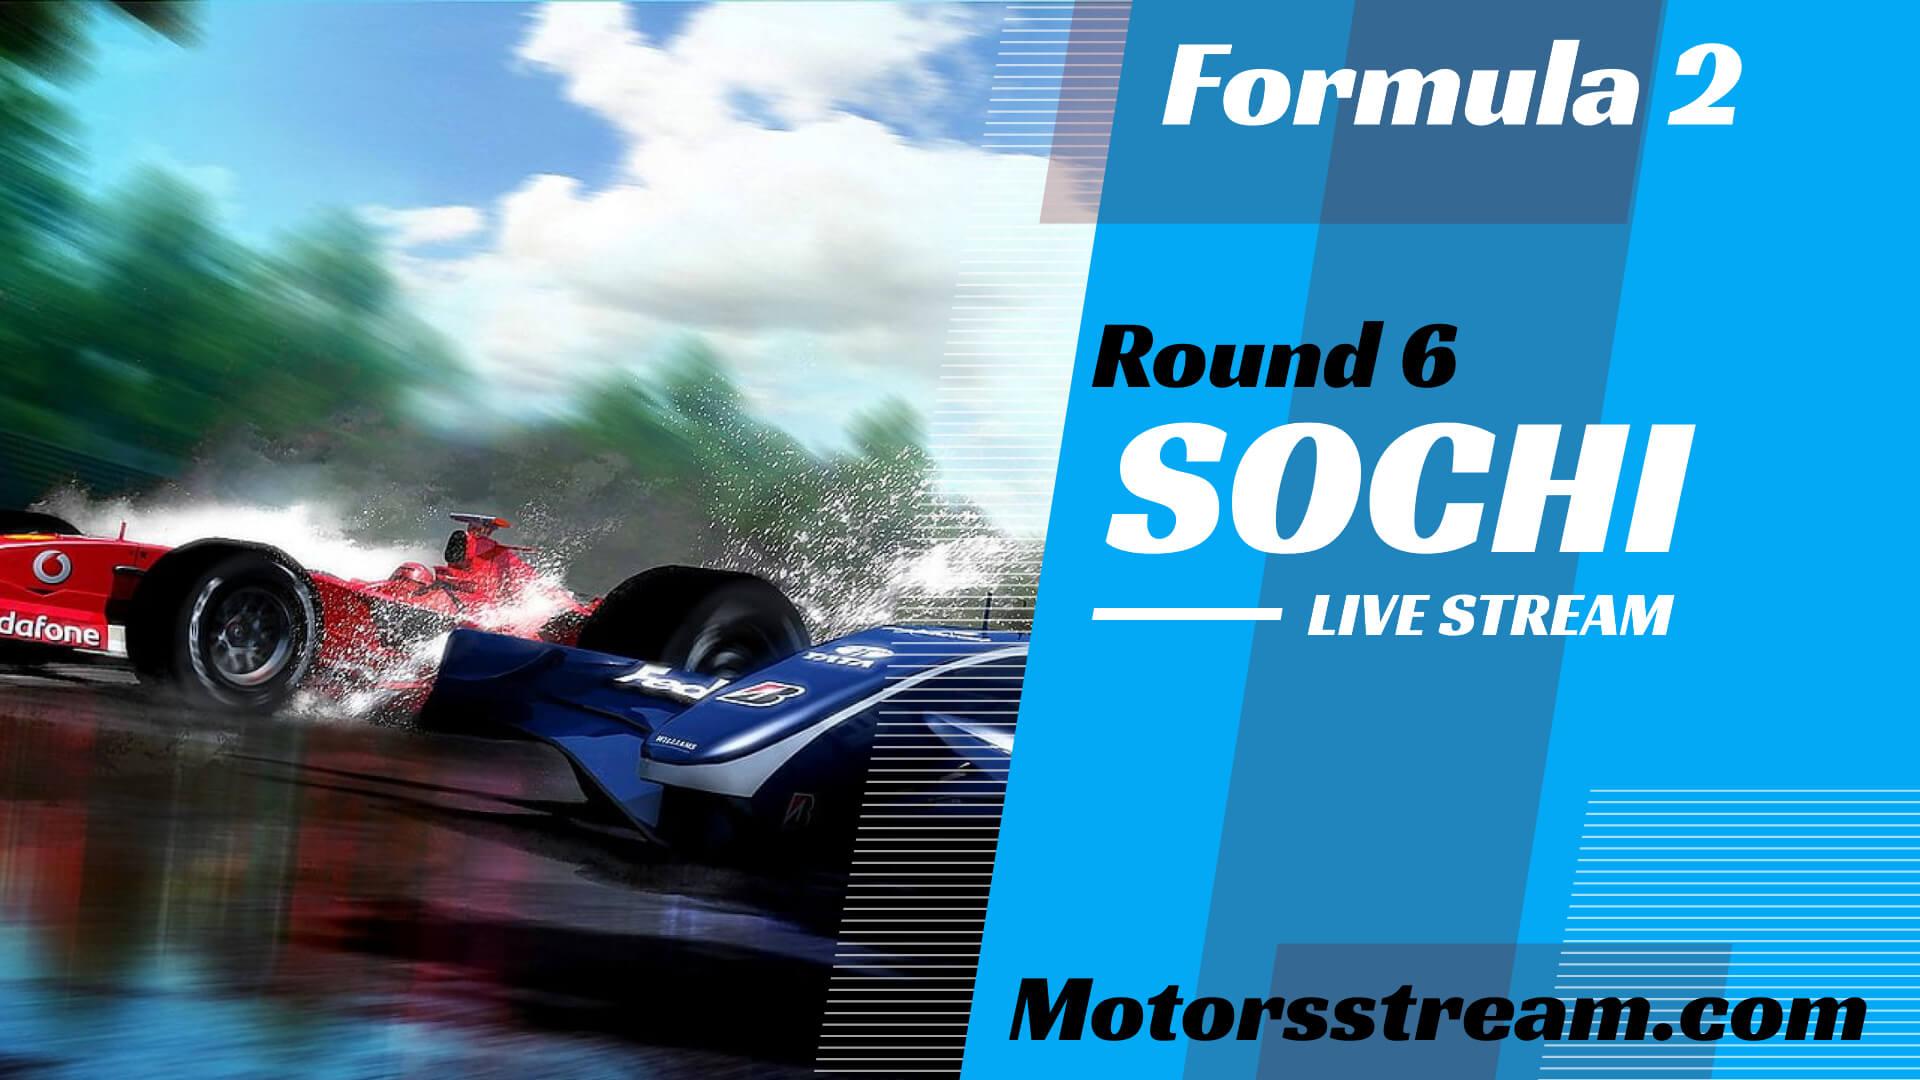 Sochi Grand Prix Live Stream 2021 | Formula 2